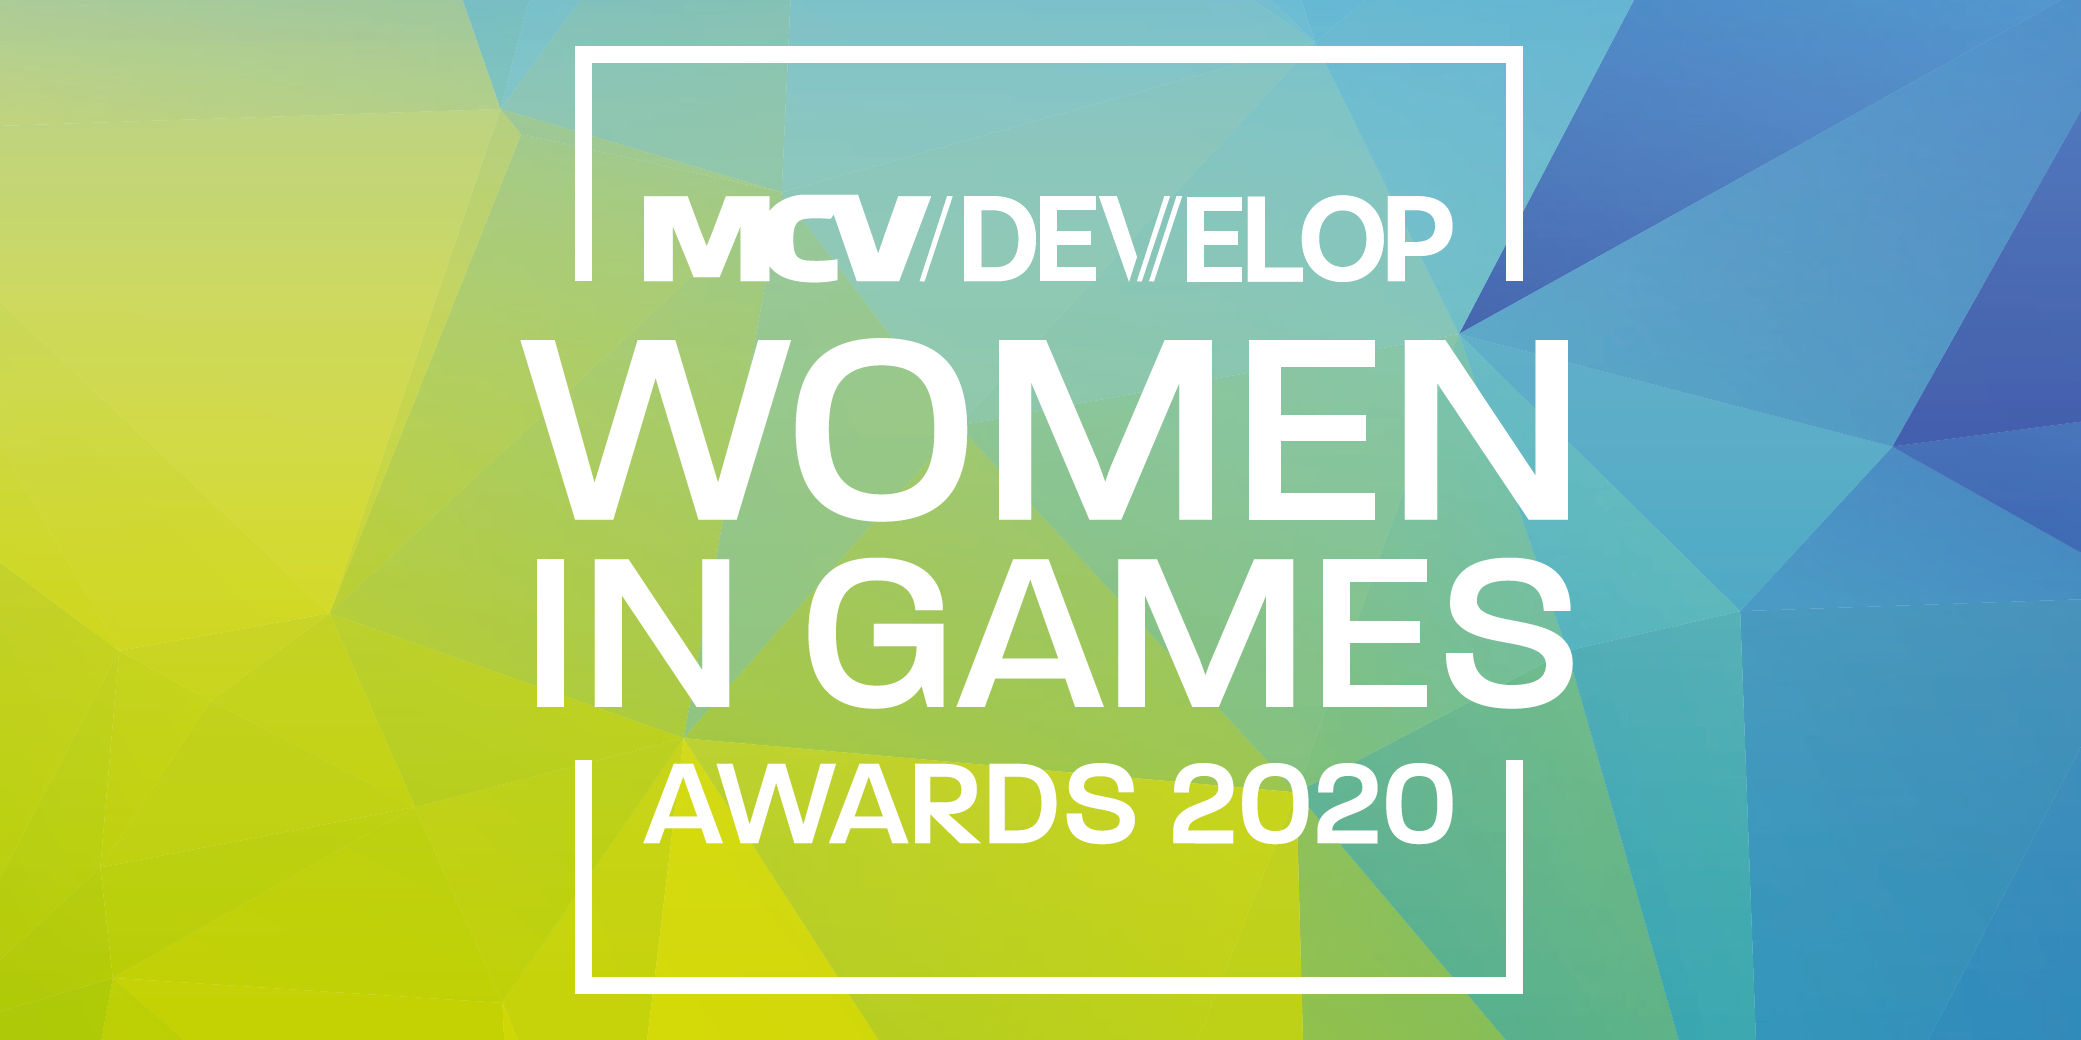 Women-in-Games-Awards-2020